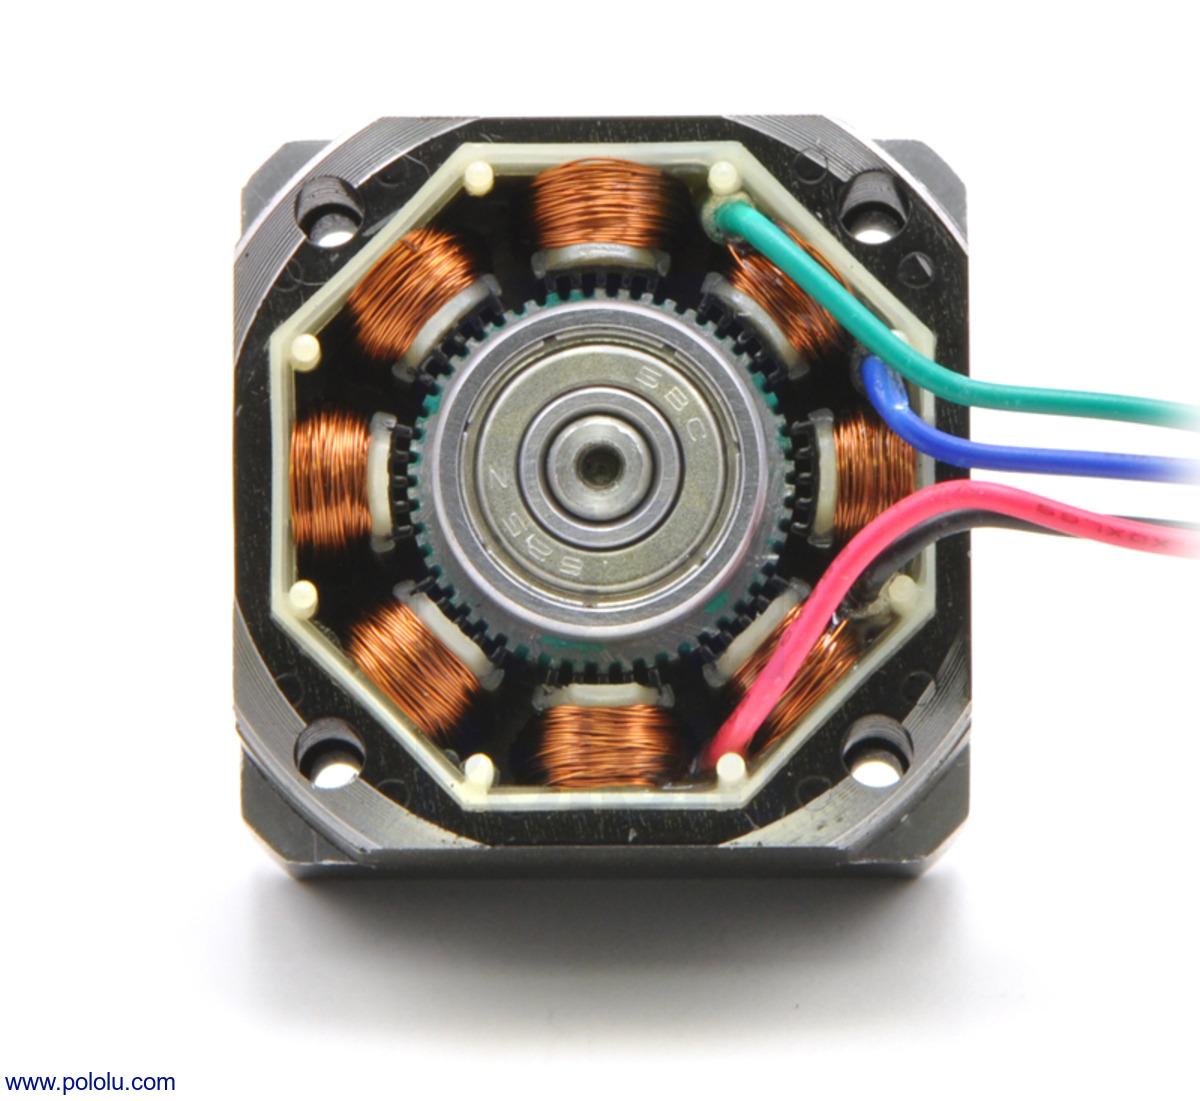 hight resolution of the inside of a bipolar stepper motor